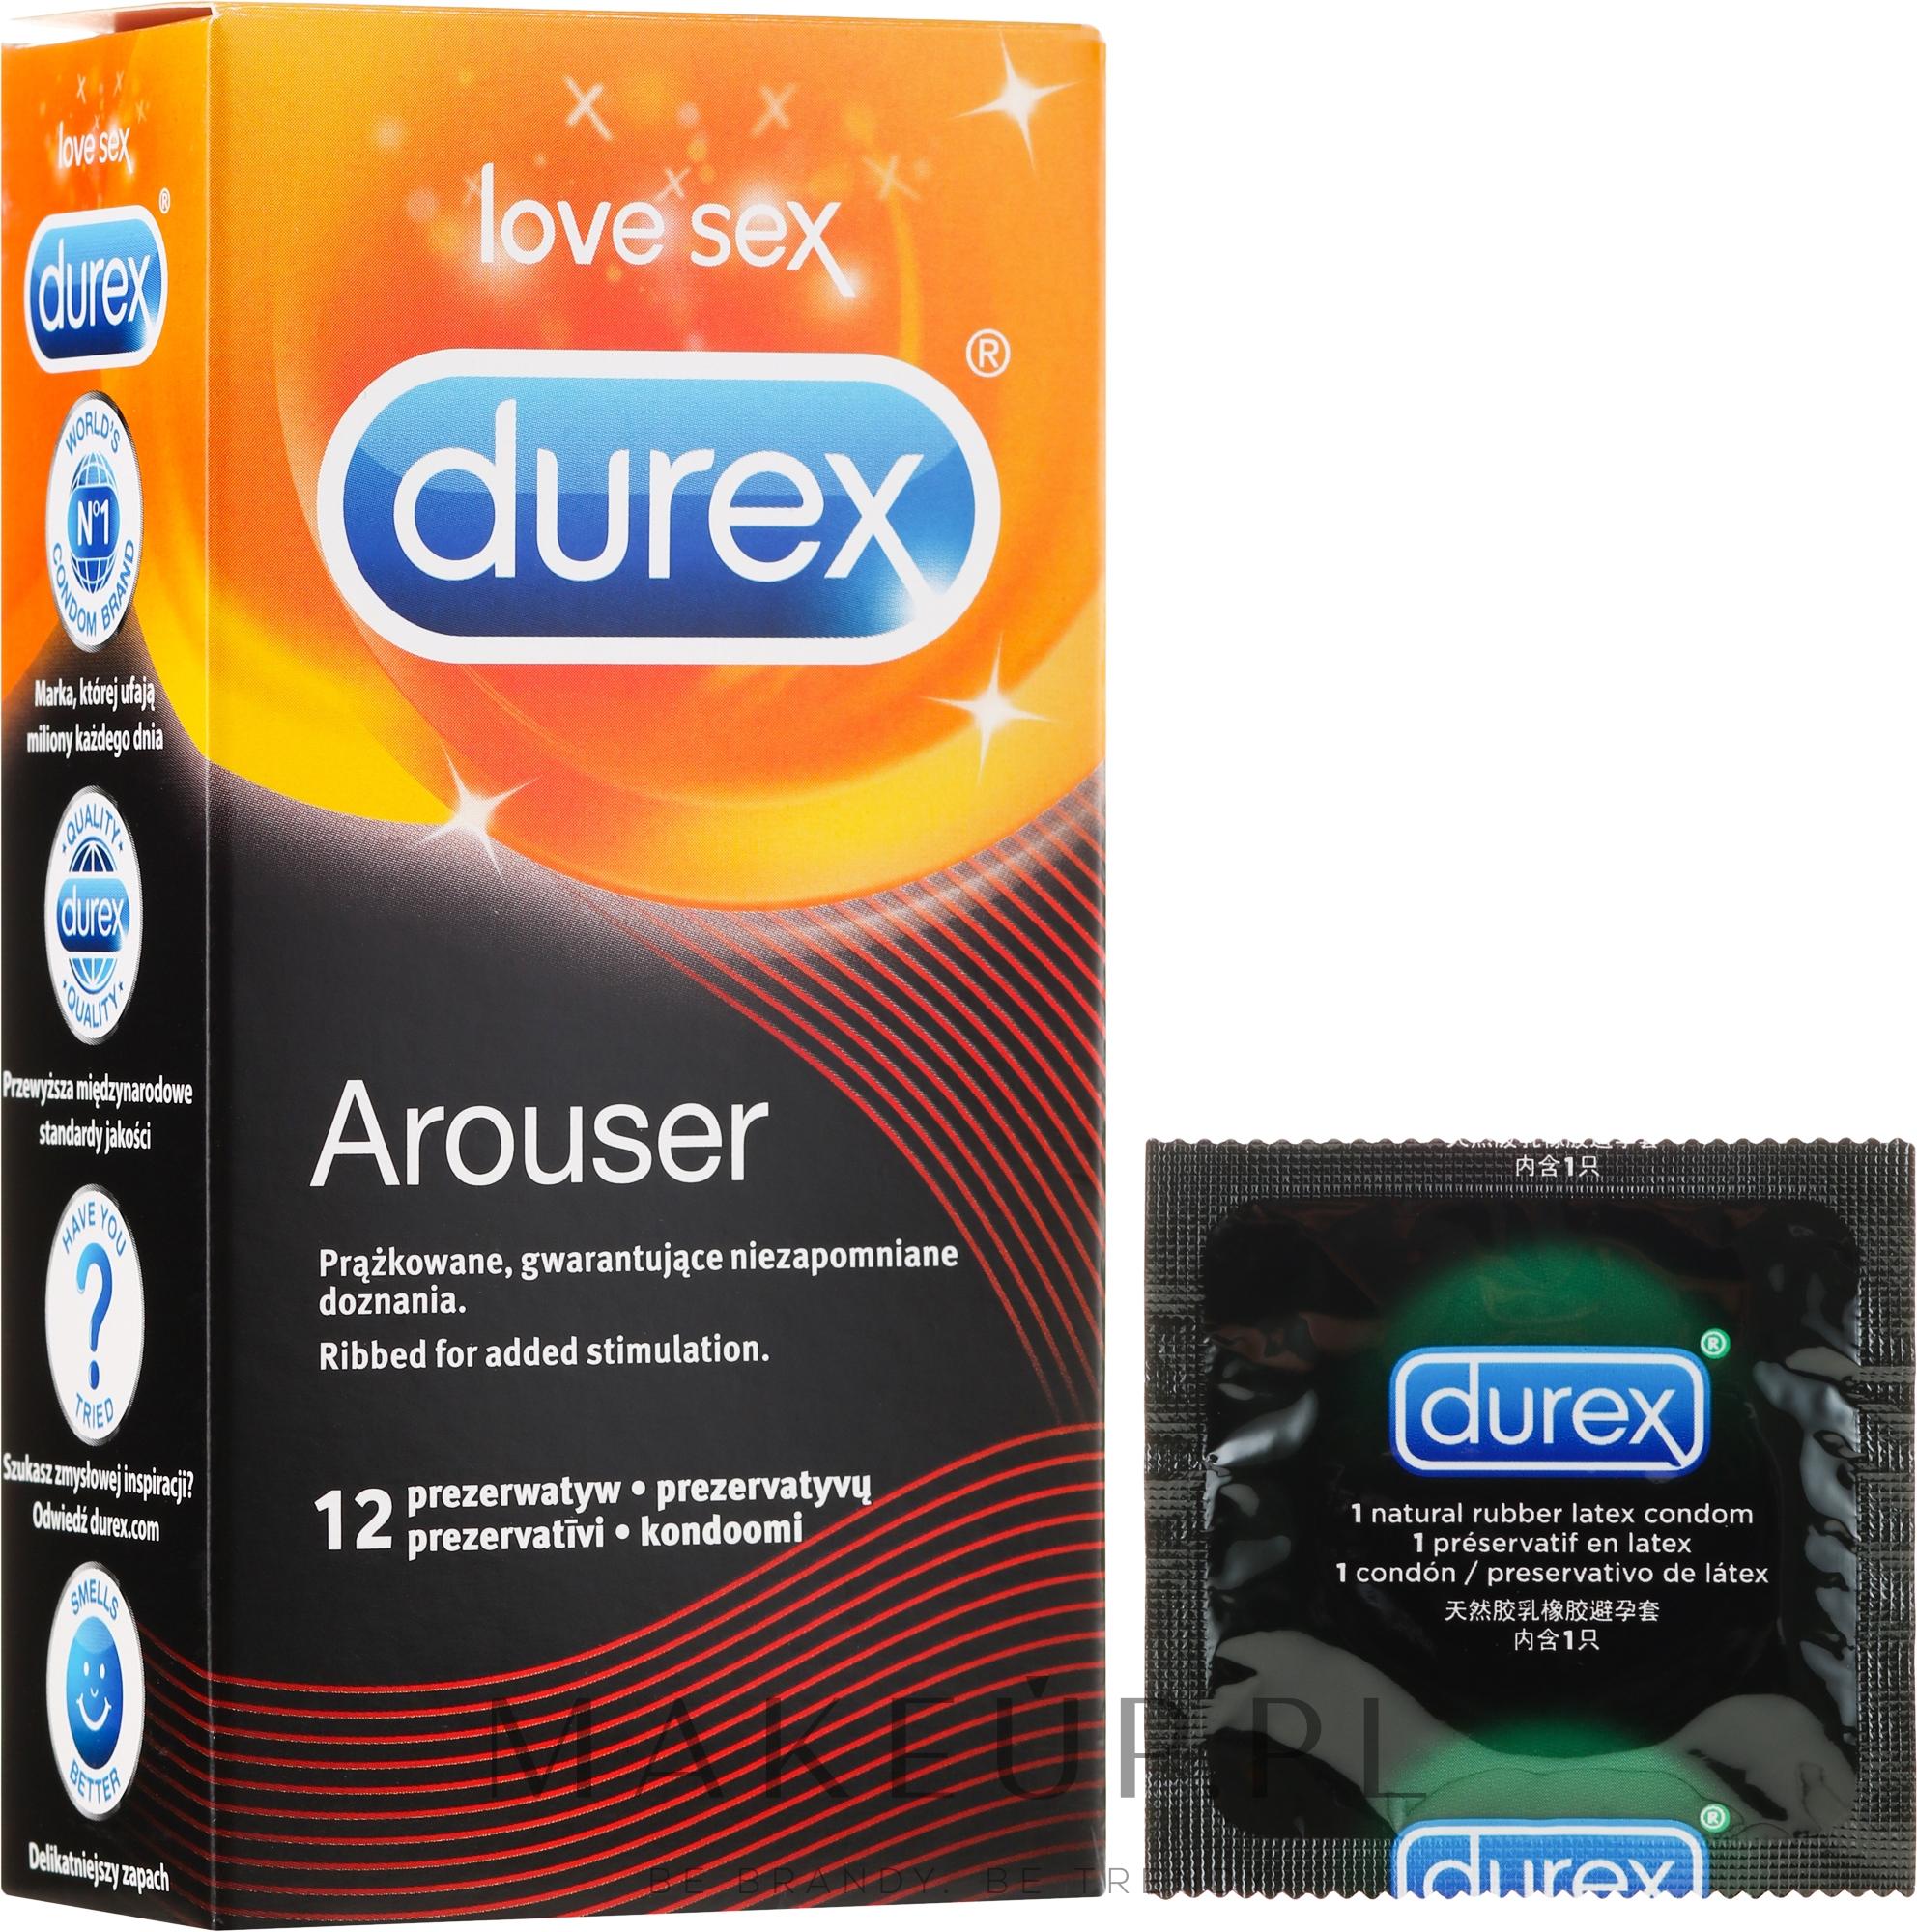 Prezerwatywy prążkowane, 12 szt. - Durex Arouser — фото 12 szt.